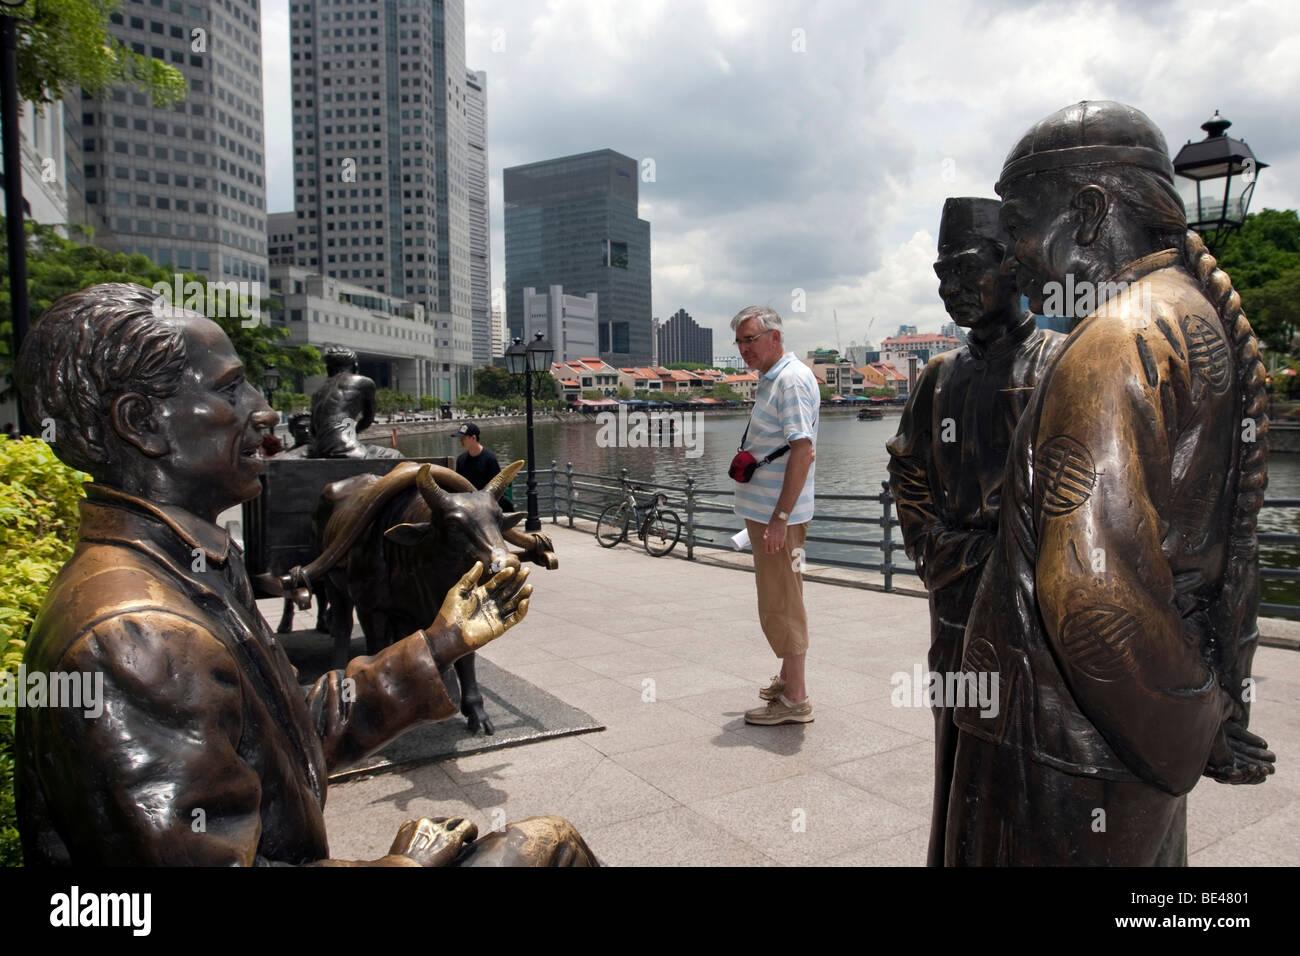 THE RIVER MERCHANTS, bronze sculpture by Aw Tee Hong, Flint Street, Fullerton Square, Singapore, Southeast Asia - Stock Image